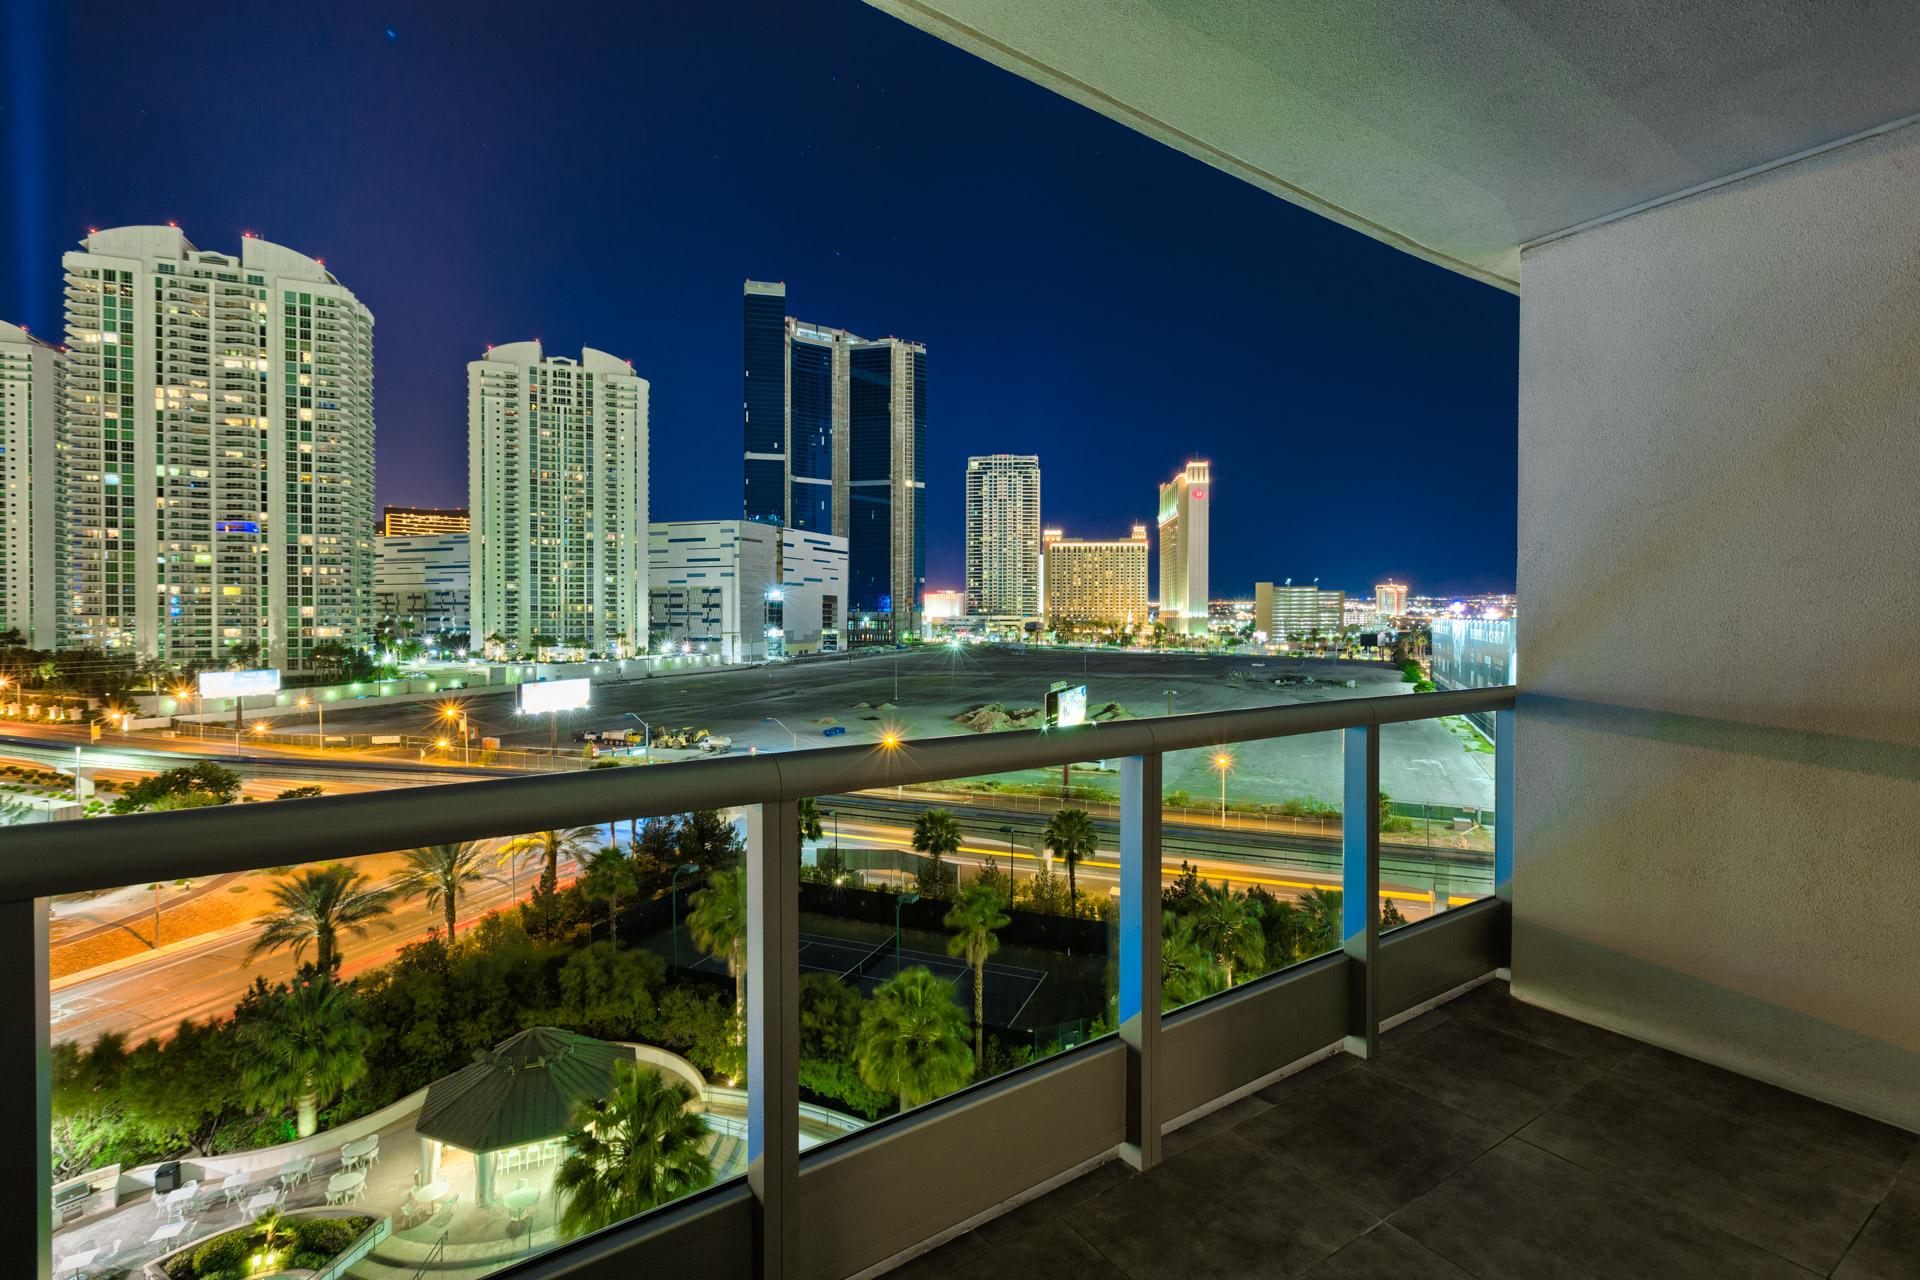 Turnberry-Towers-Las-Vegas-Luxury-Condos-For-Sale-Unit-801-Strip-View